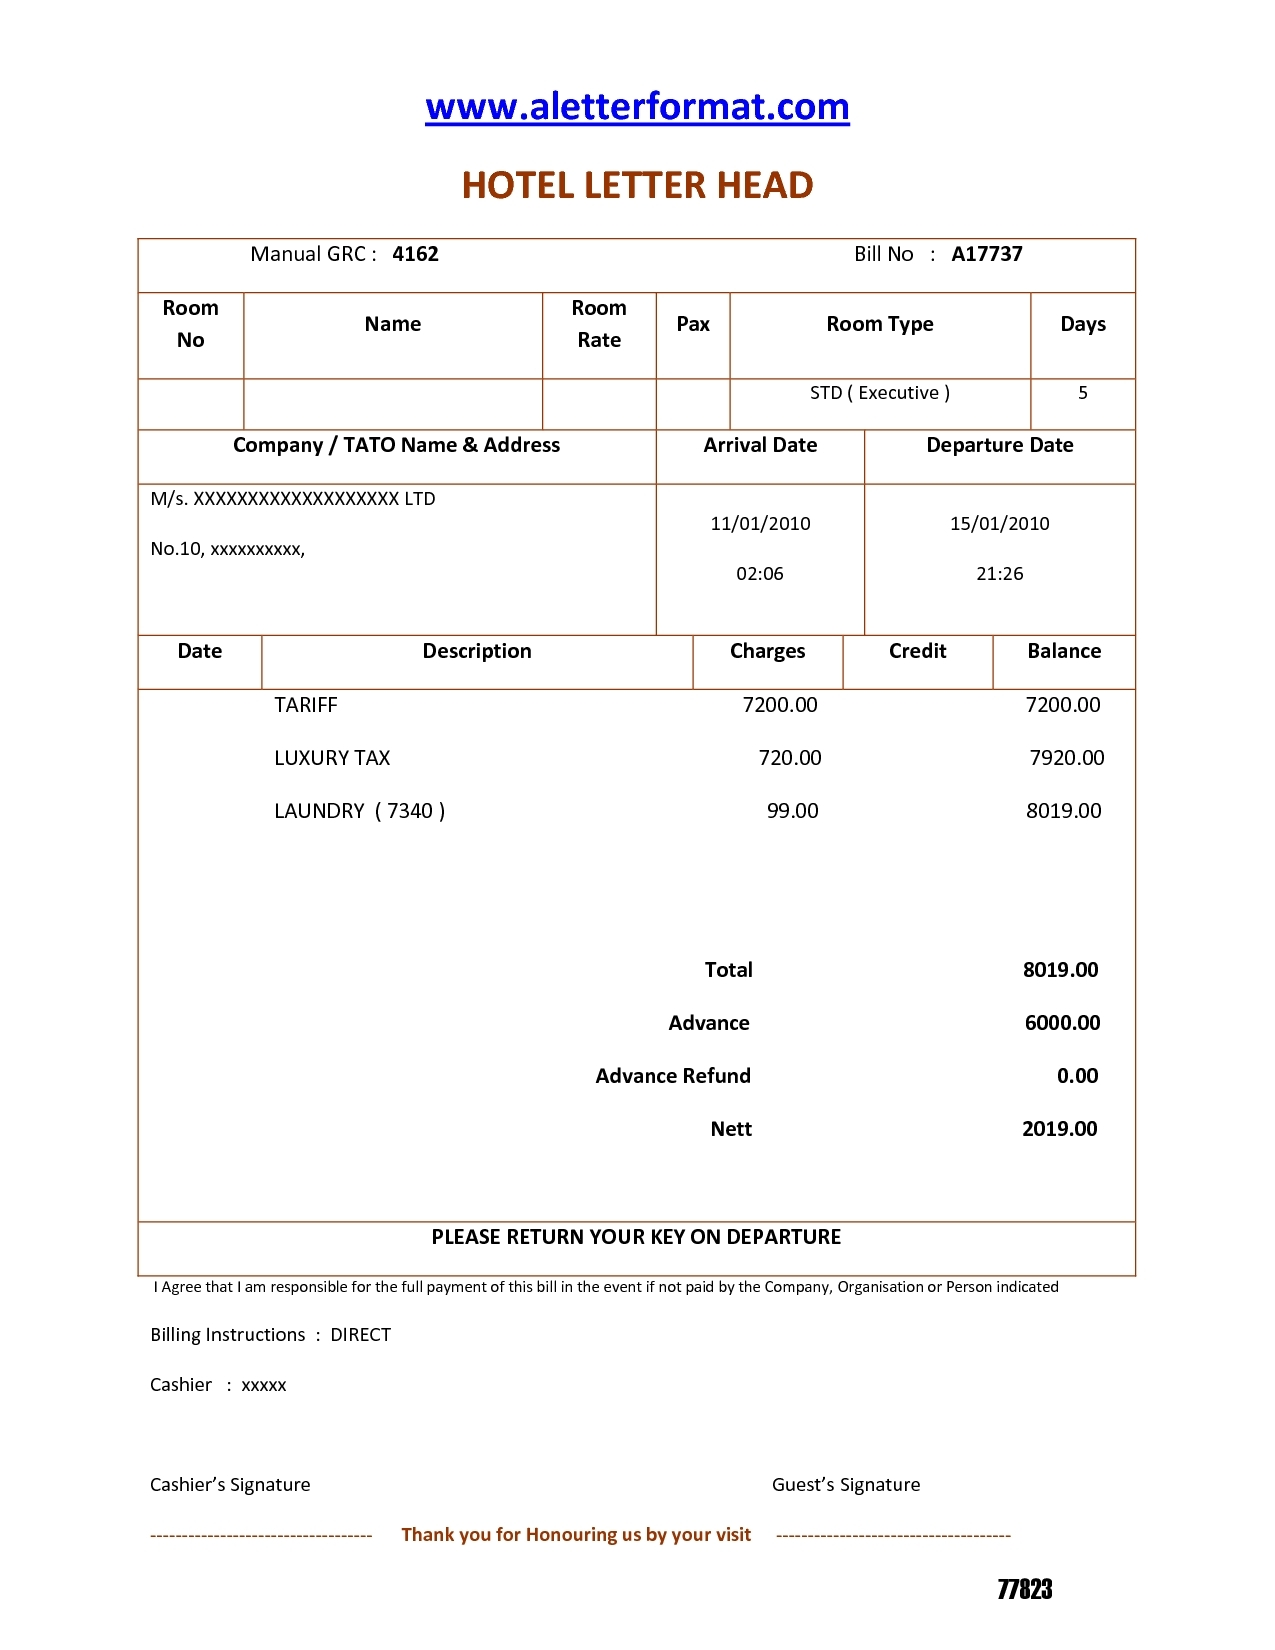 sample hotel invoice invoice template free 2016 hotel invoice format